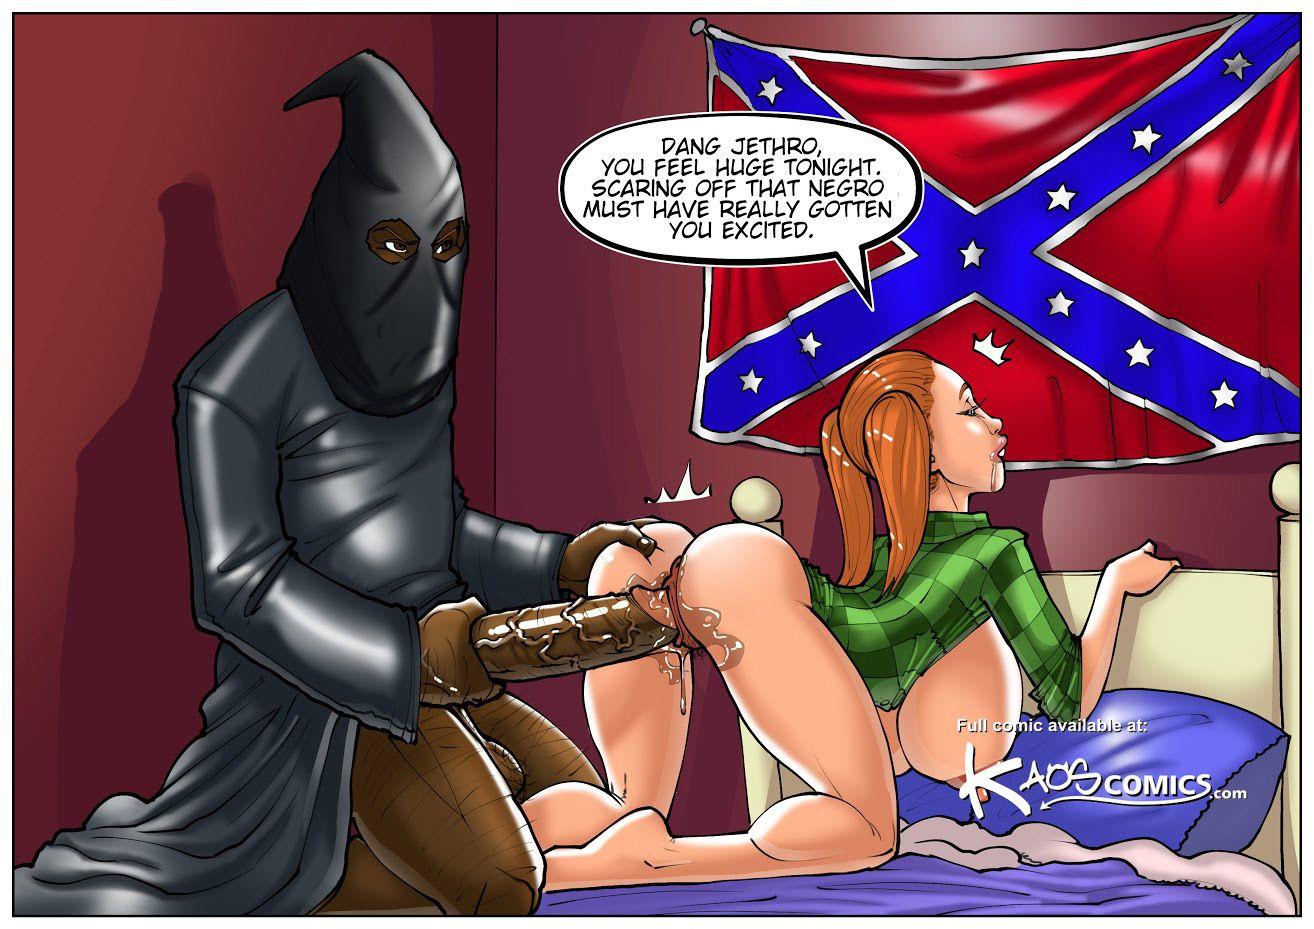 interracial cartoon hentai interracial-cartoon-never-fucked-like-this-a.jpg 1,314